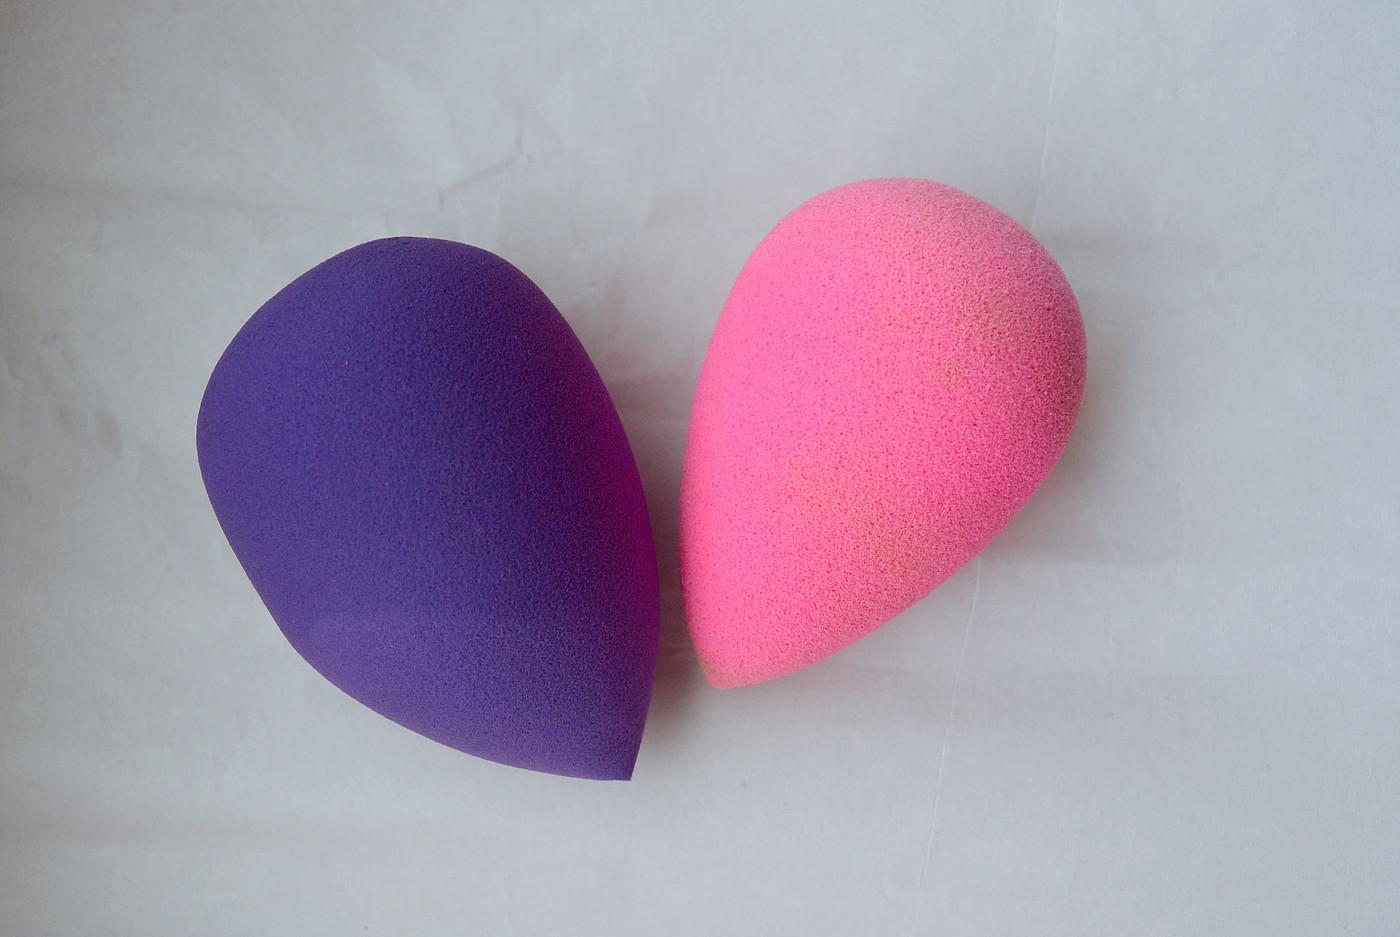 pinkviolet2.jpg